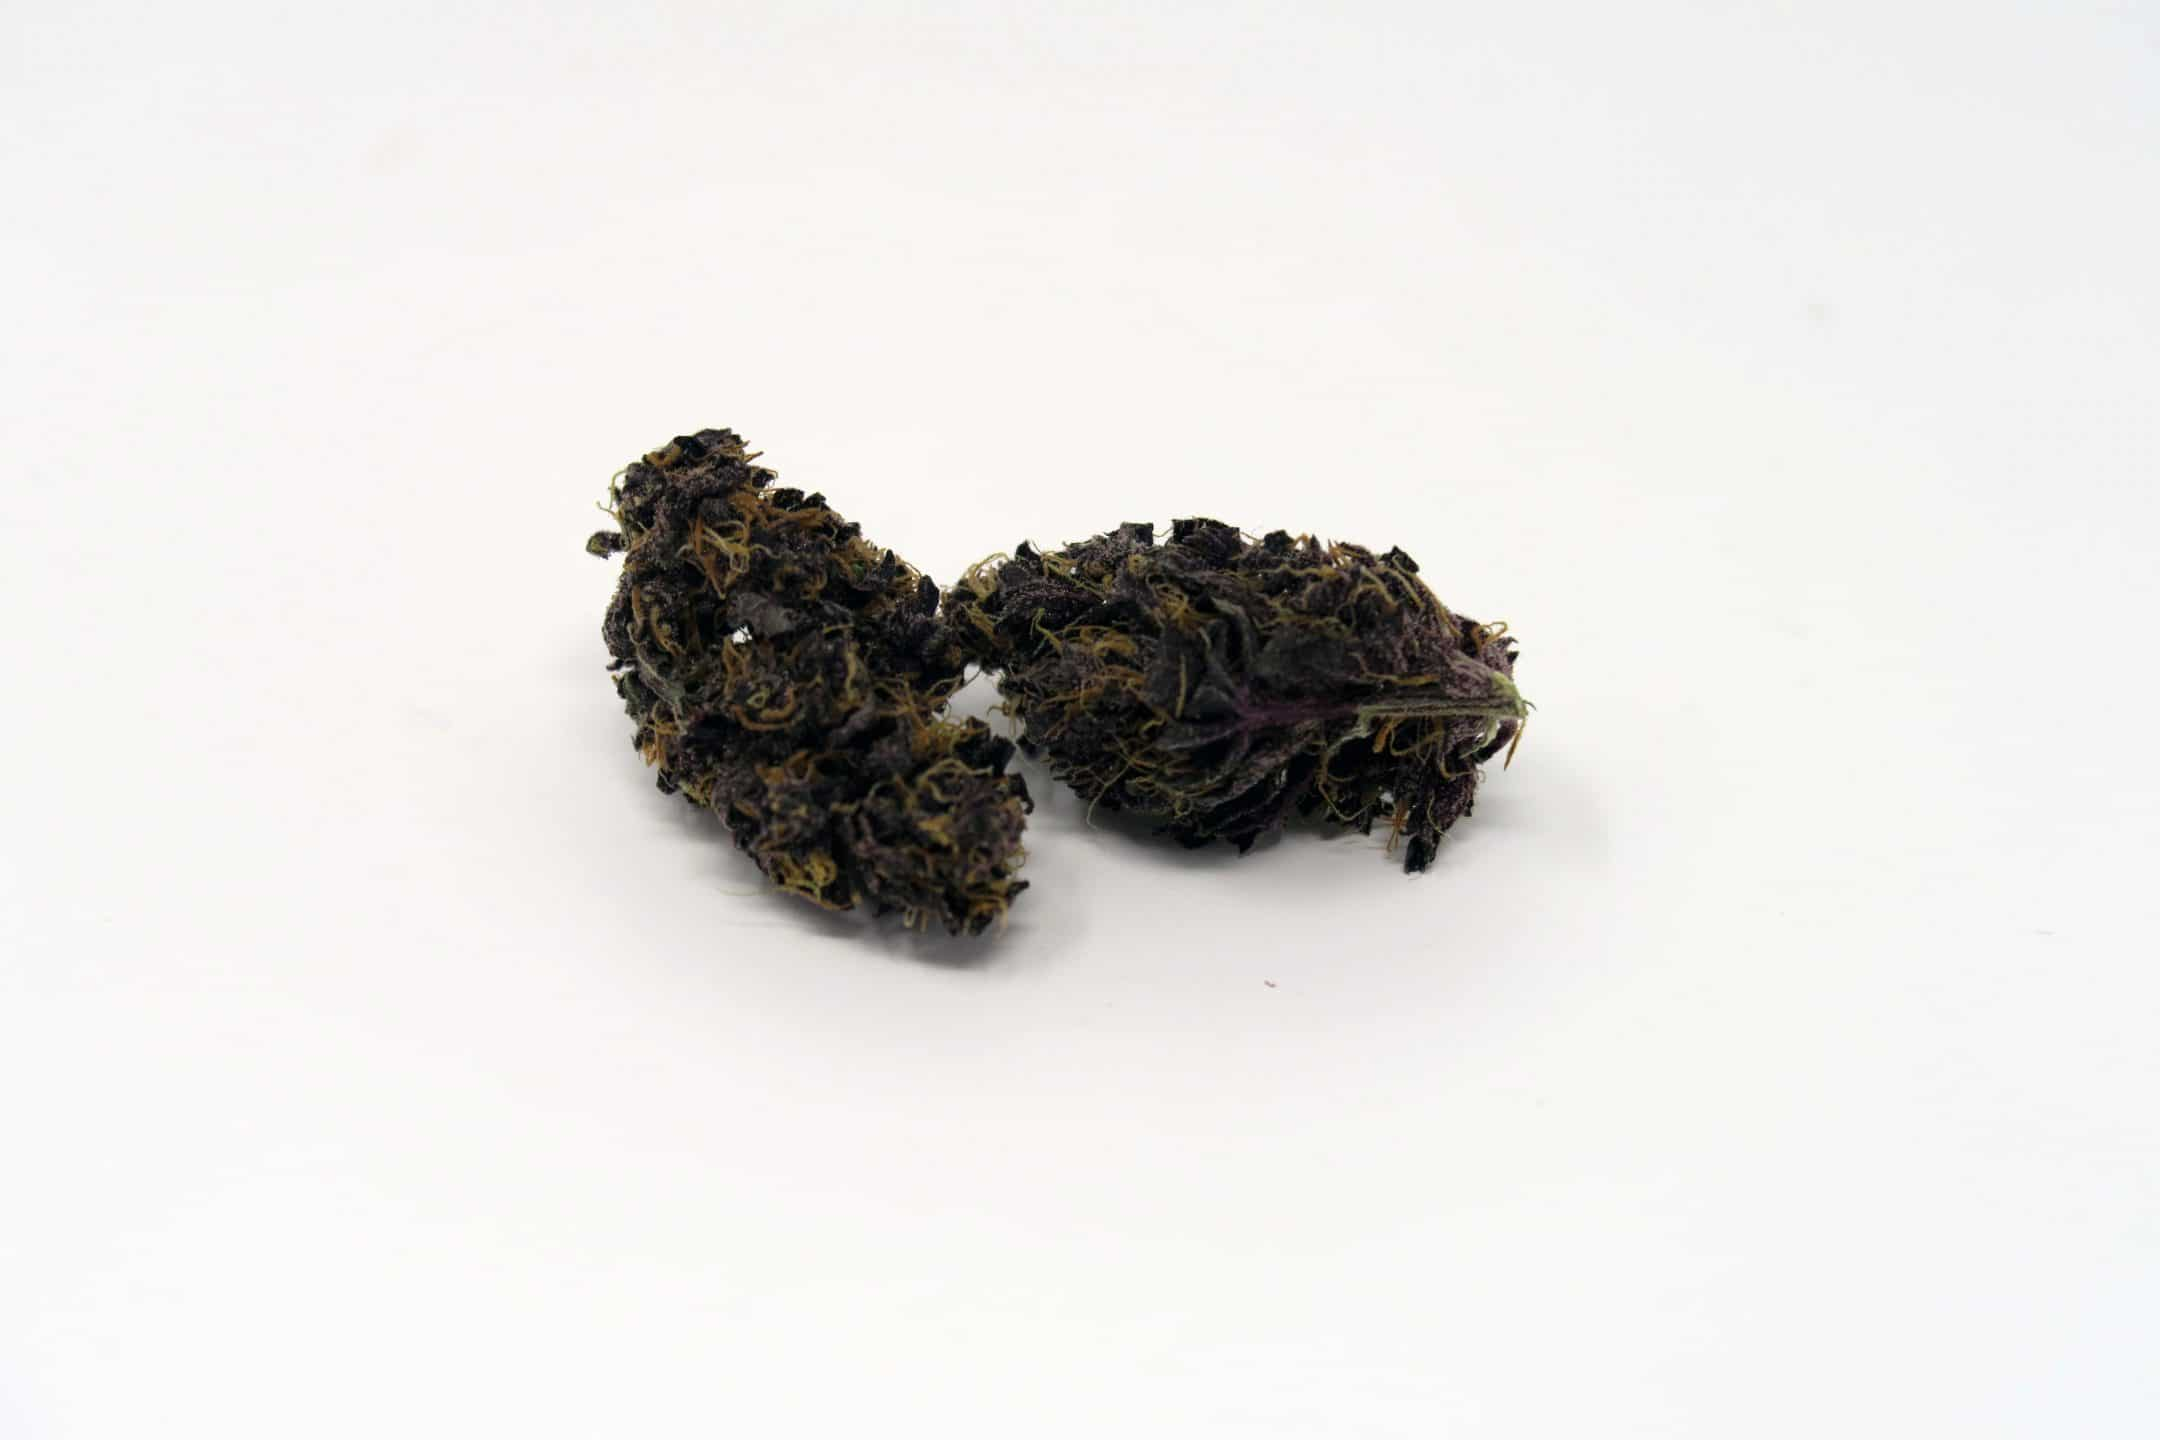 blackberry weed - photo #29